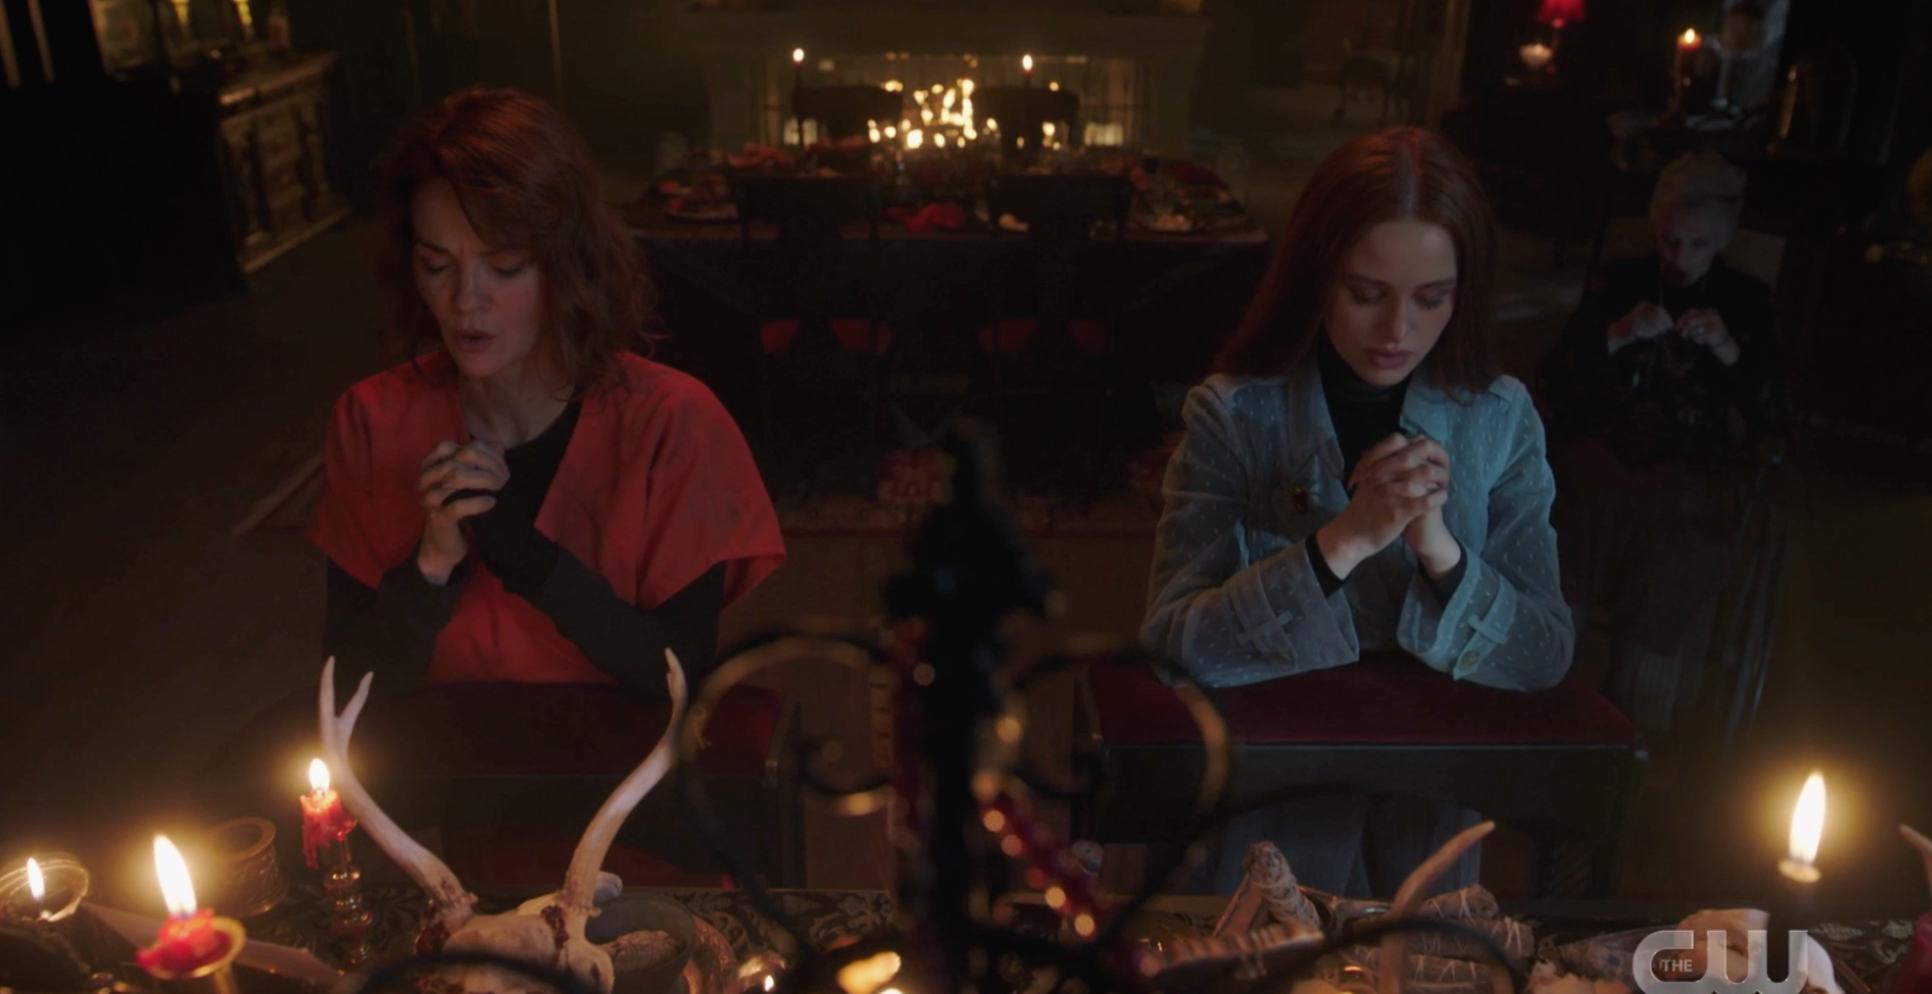 Penelope and Cheryl praying